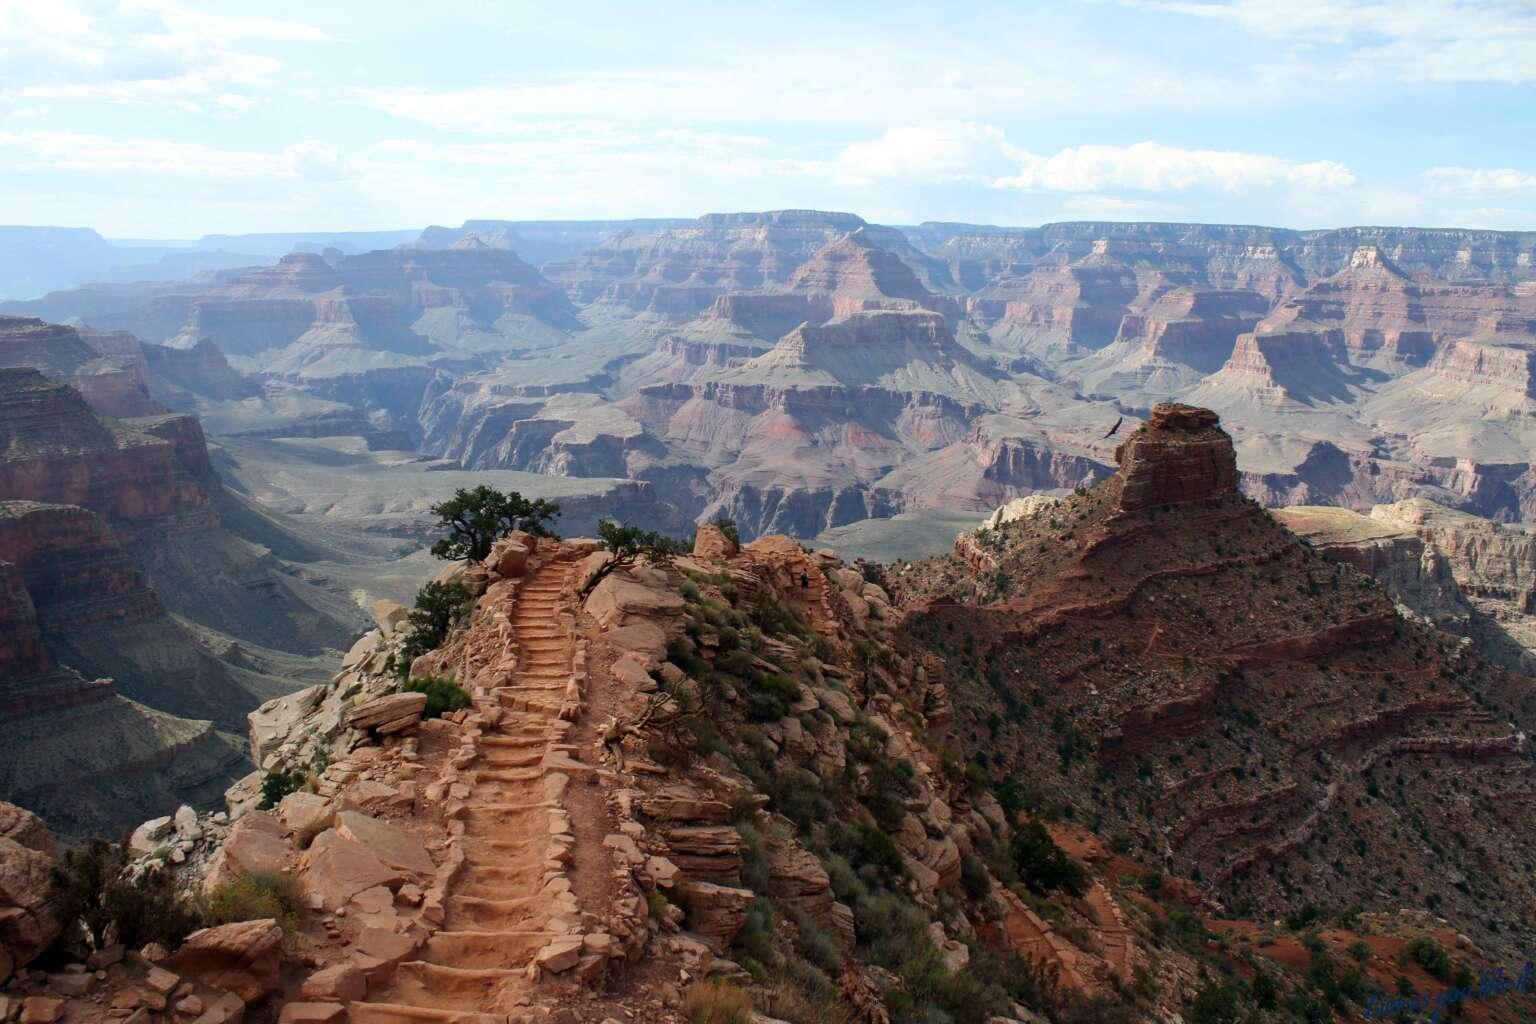 Steps in Grand Canyon South Rim, Arizona